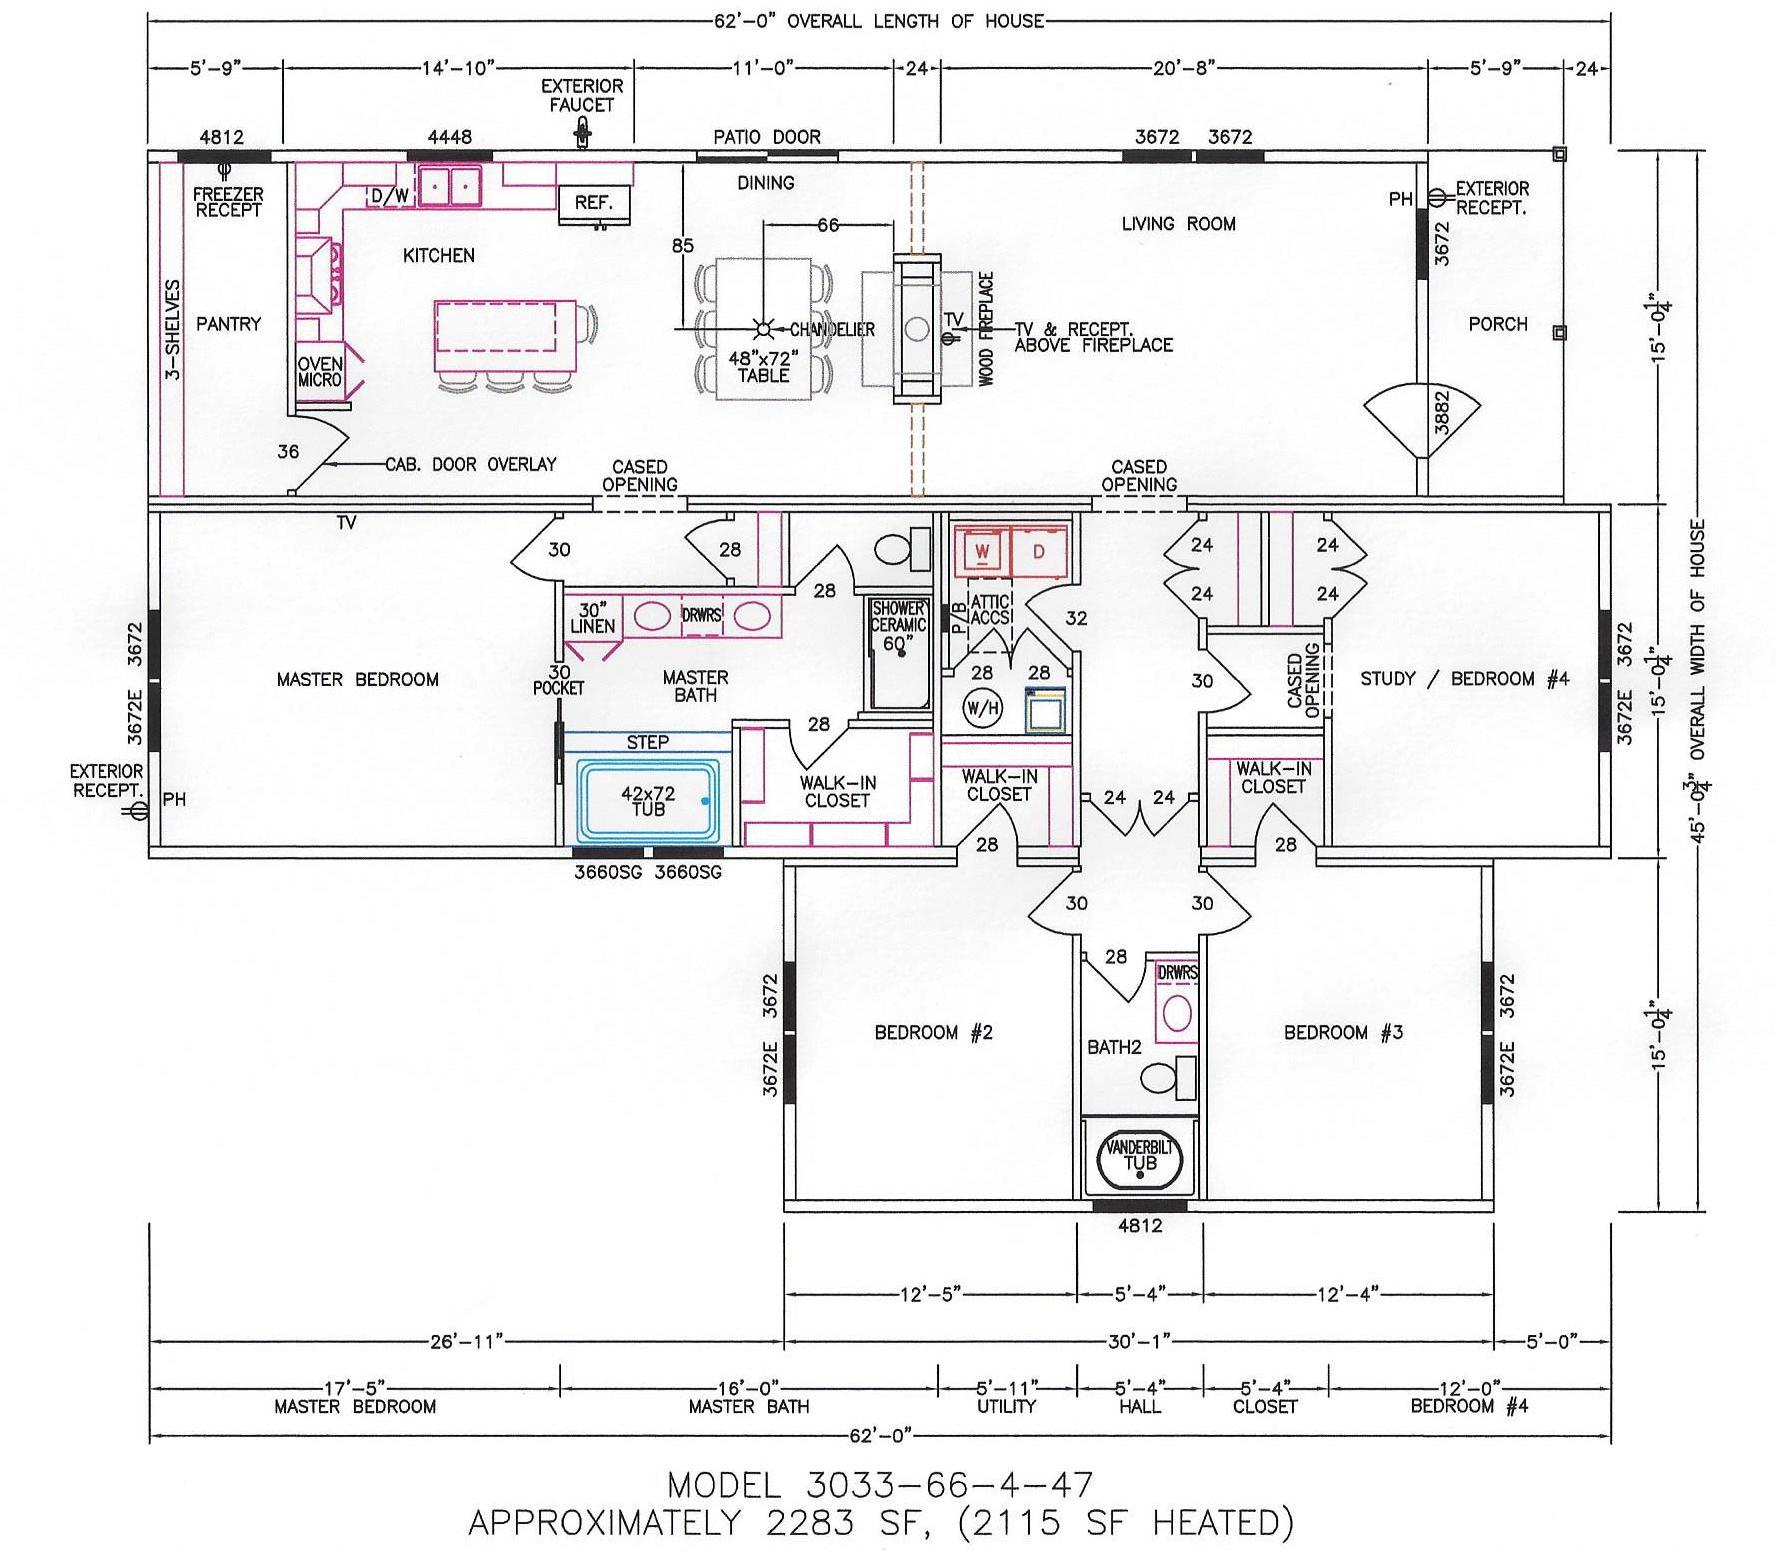 4 Bedroom Floor Plan: F-3033 - Hawks Homes